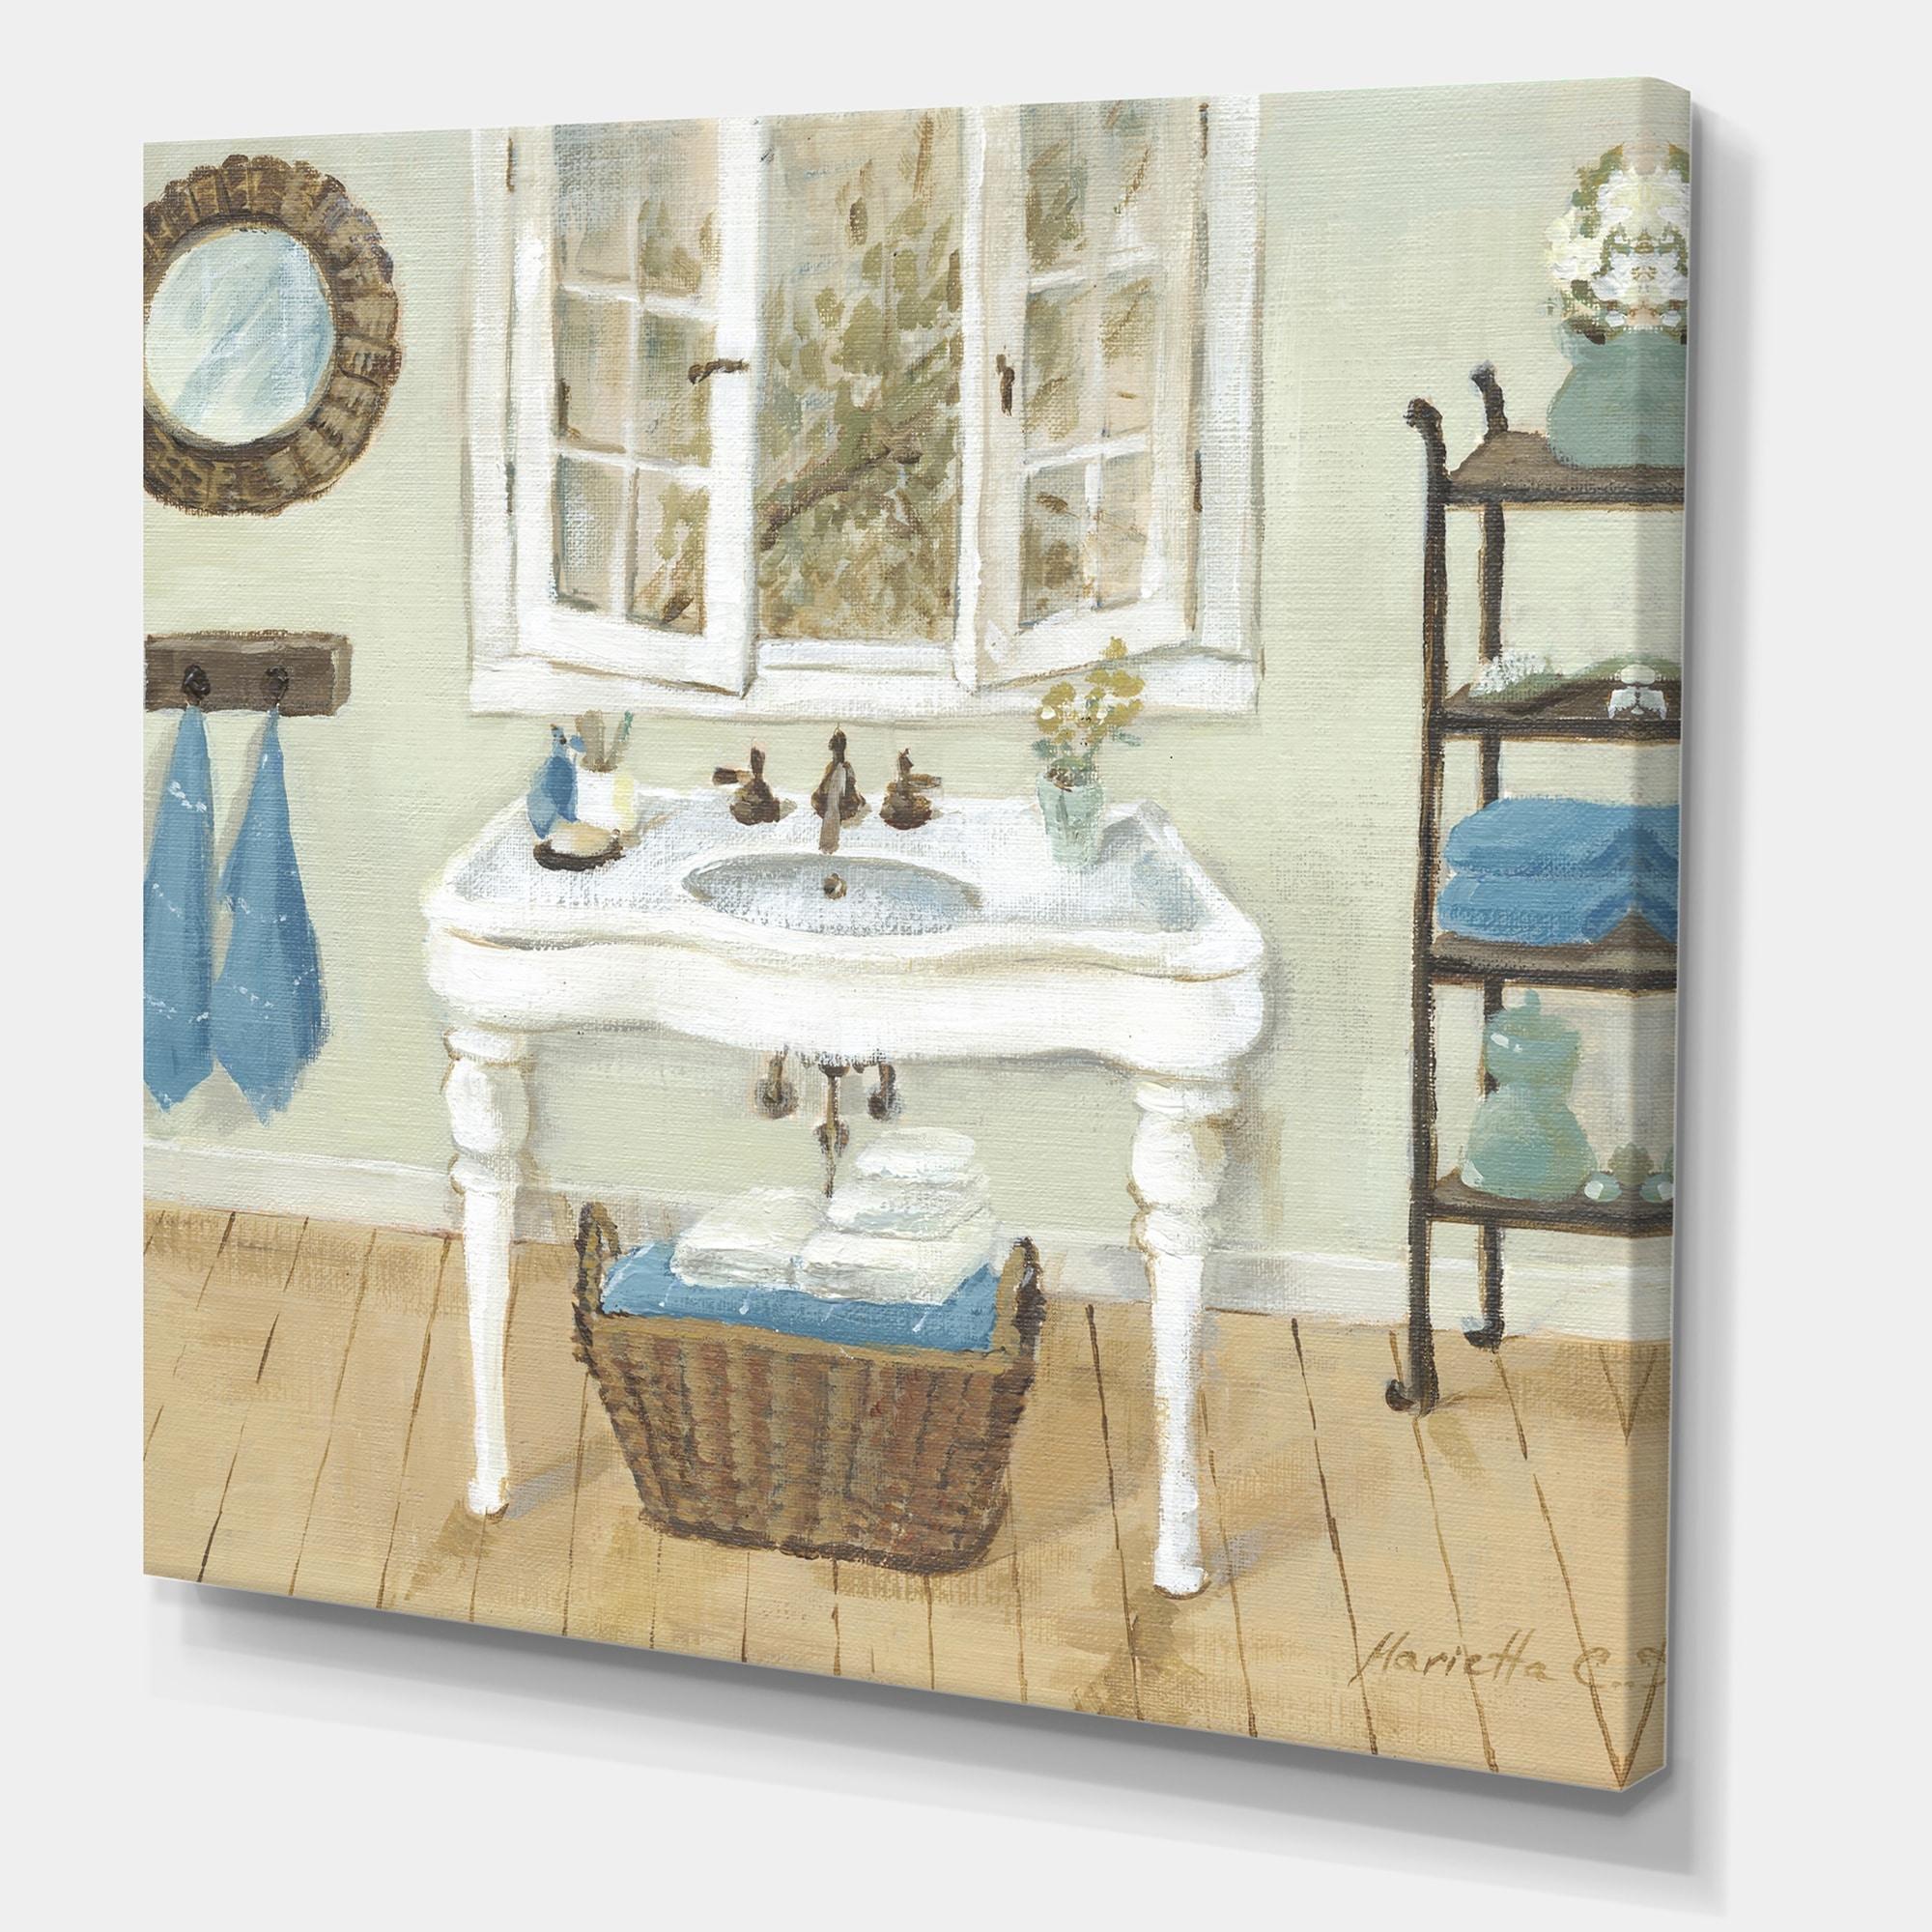 Shop Designart French Country Bathroom I Vintage Canvas Art Print On Sale Overstock 27777467